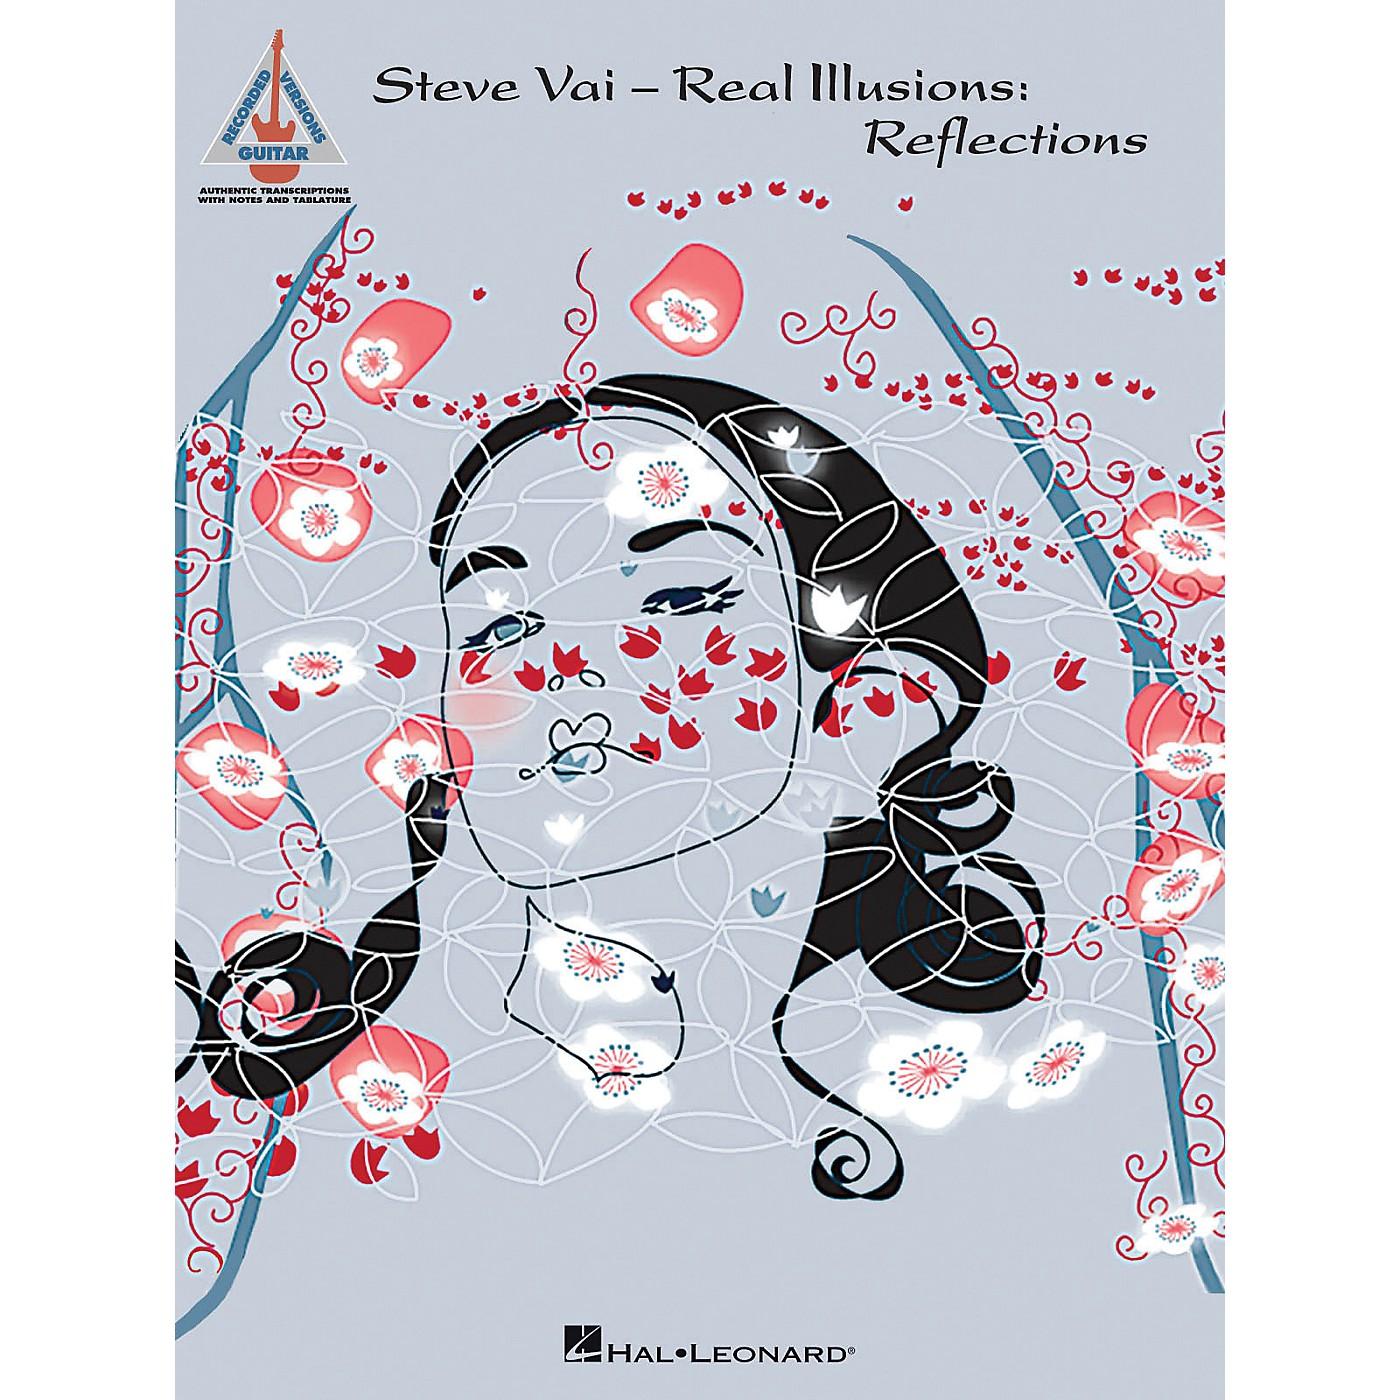 Hal Leonard Steve Vai - Real Illusions: Reflections Guitar Tab Songbook thumbnail